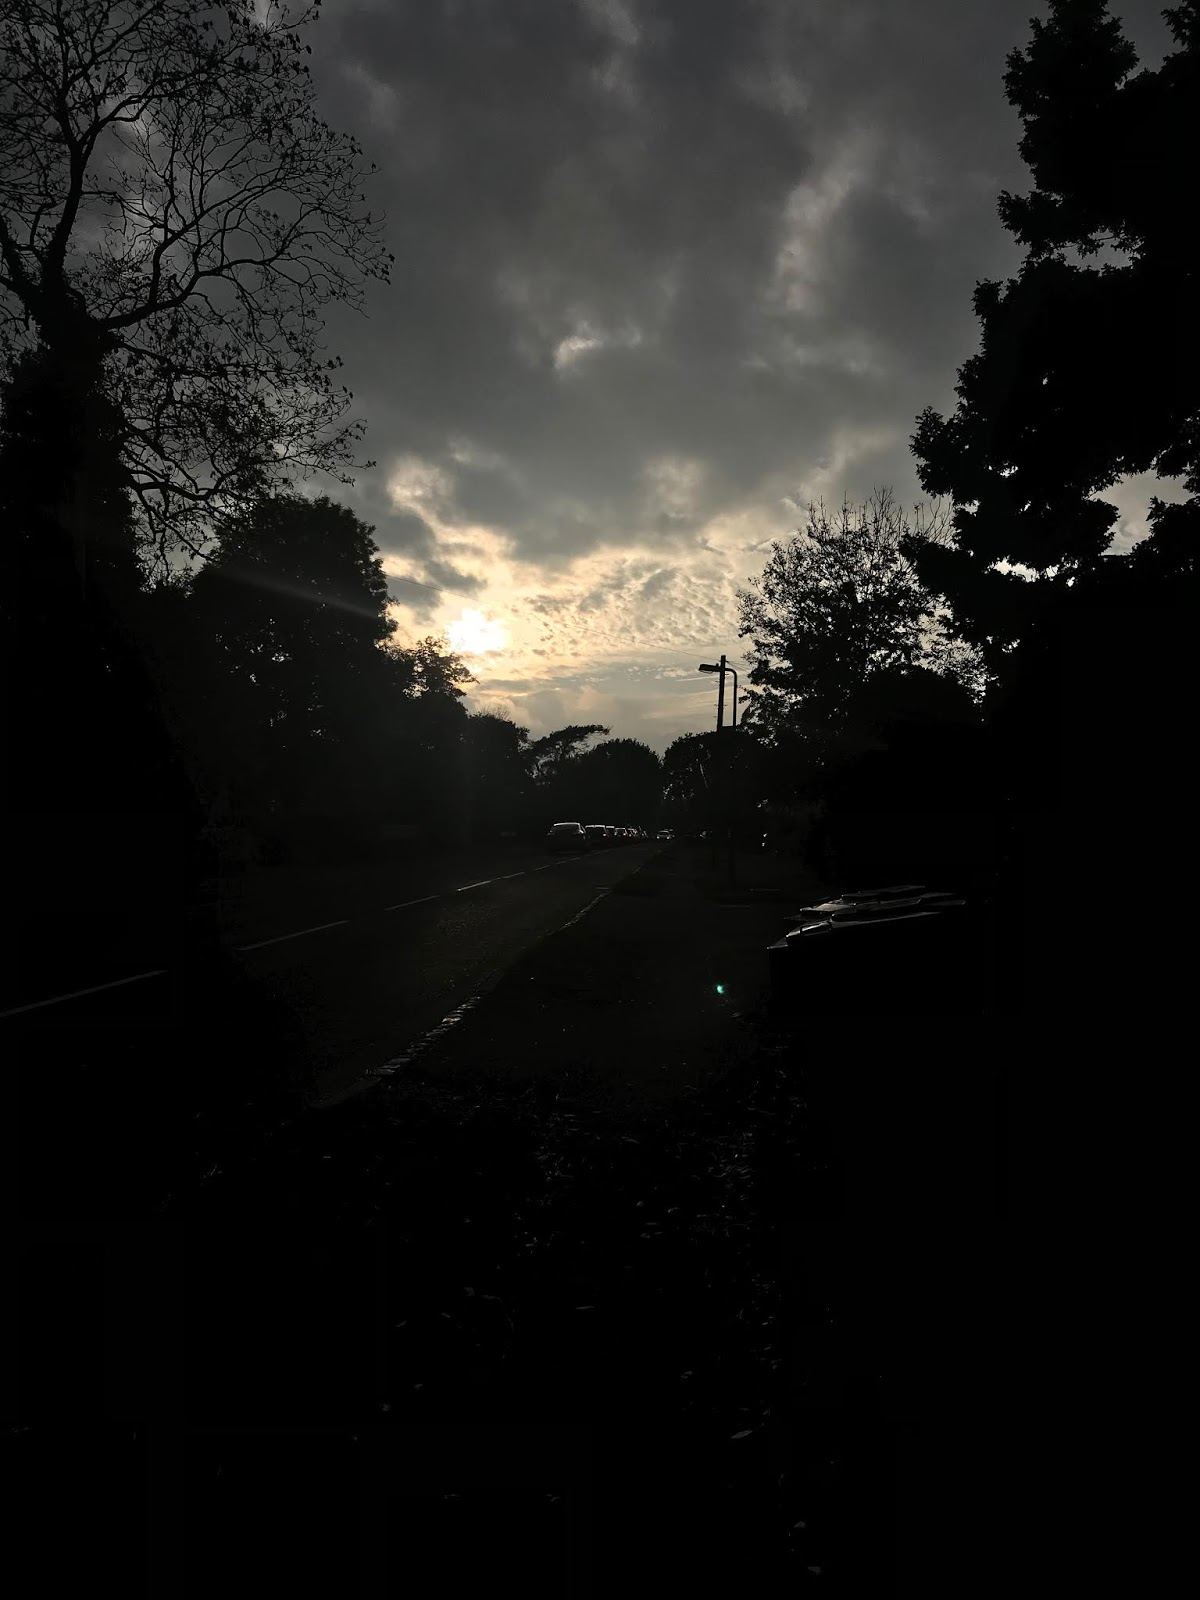 Sunset on Shawhurst Lane